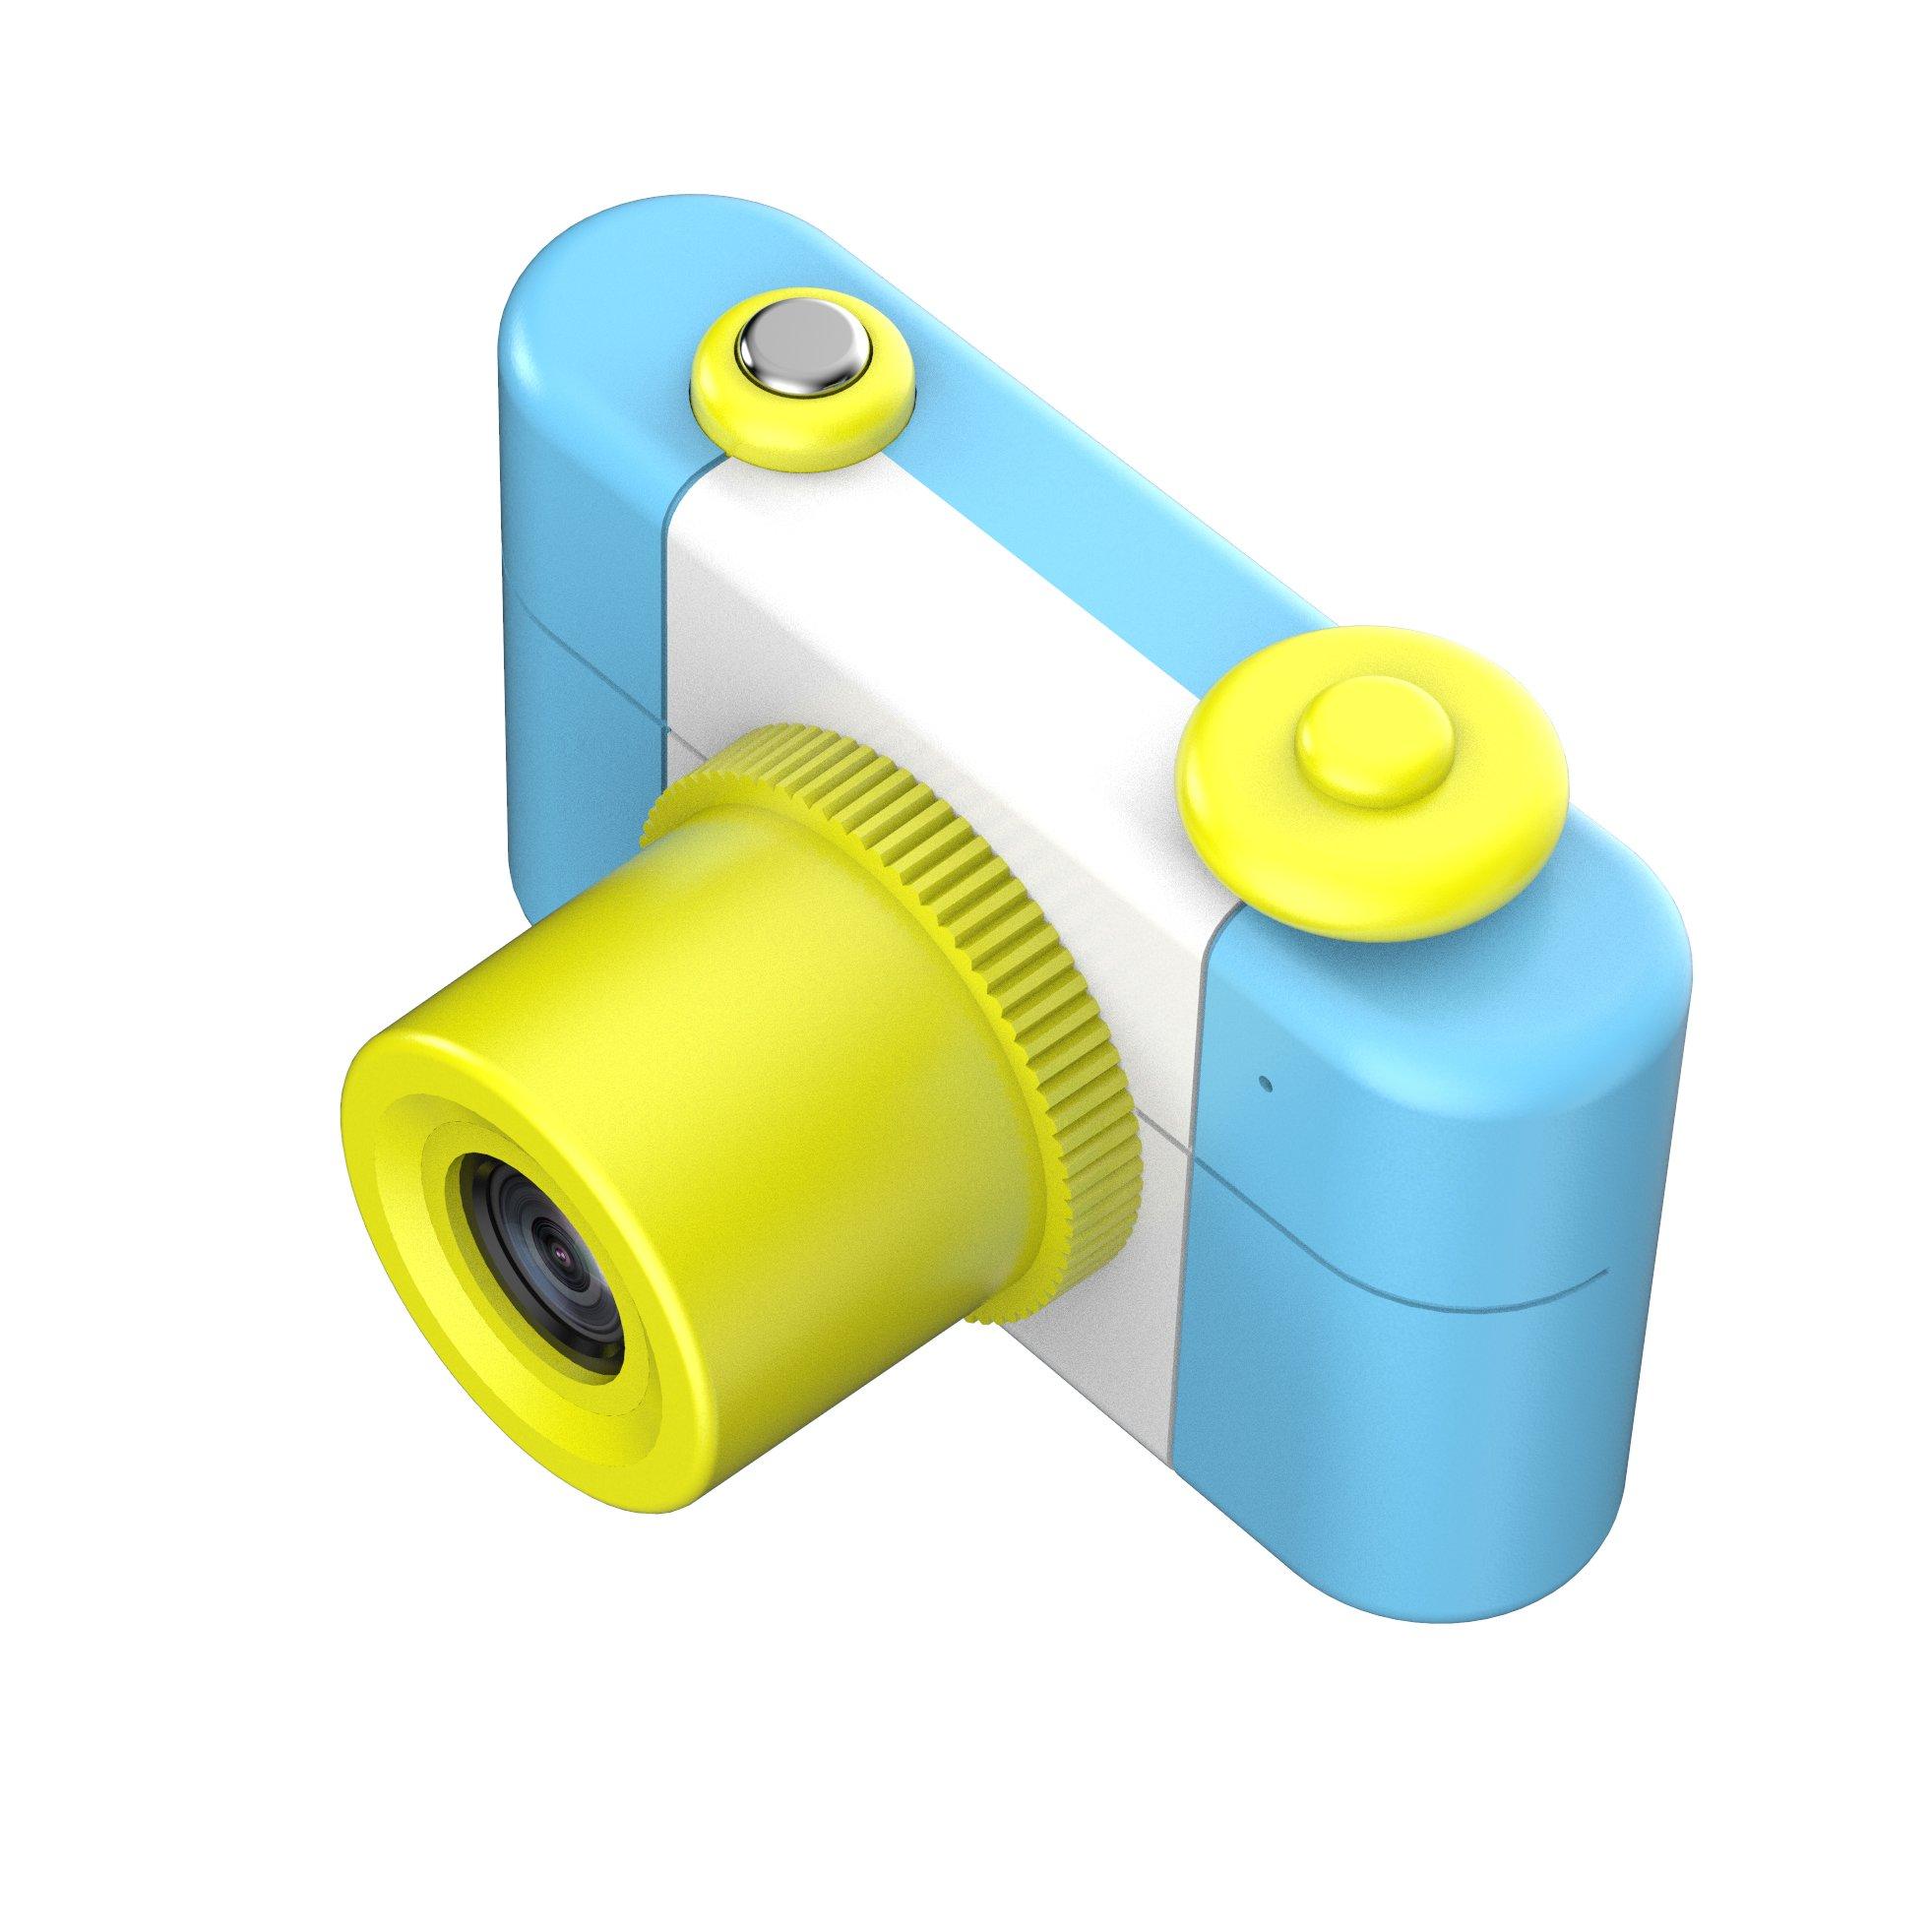 CamKing Kids Children's Camera, 1.5 Inch Screen Mini Digital Camera (Blue) by CamKing (Image #3)